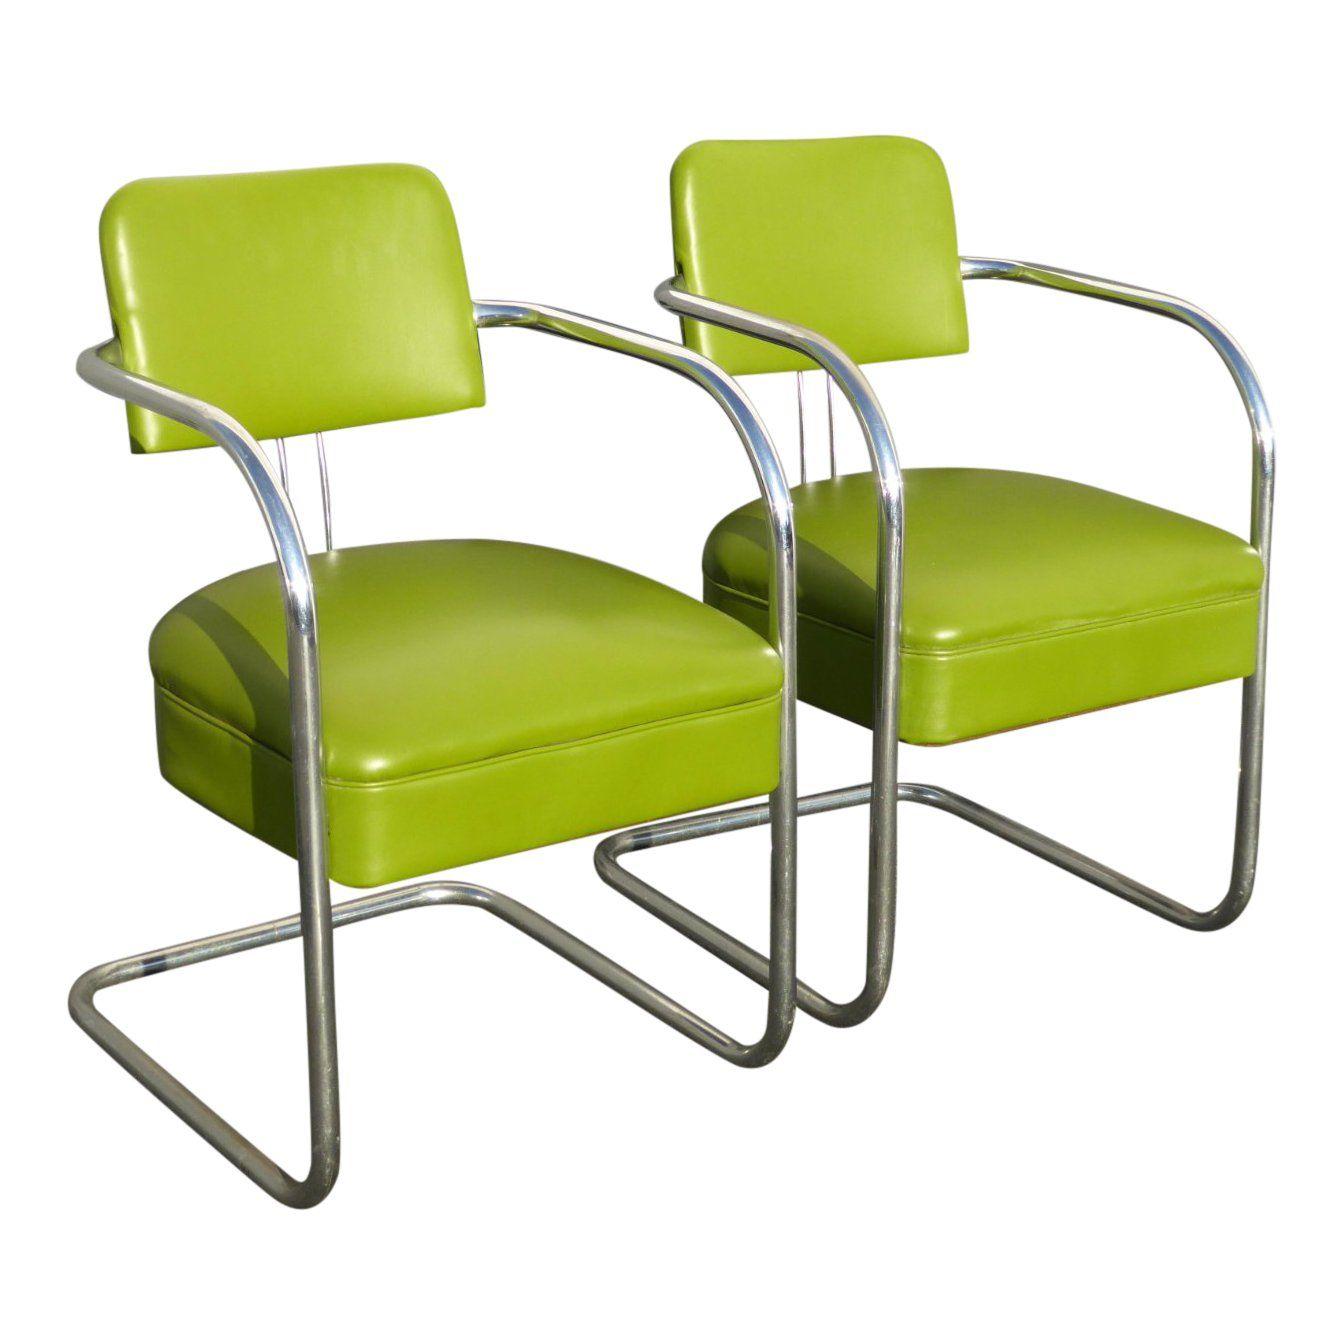 Bent Chrome Mid Century Modern Accent Chair: 1950s Vintage Mid-Century Modern Lime Green Chrome Accent